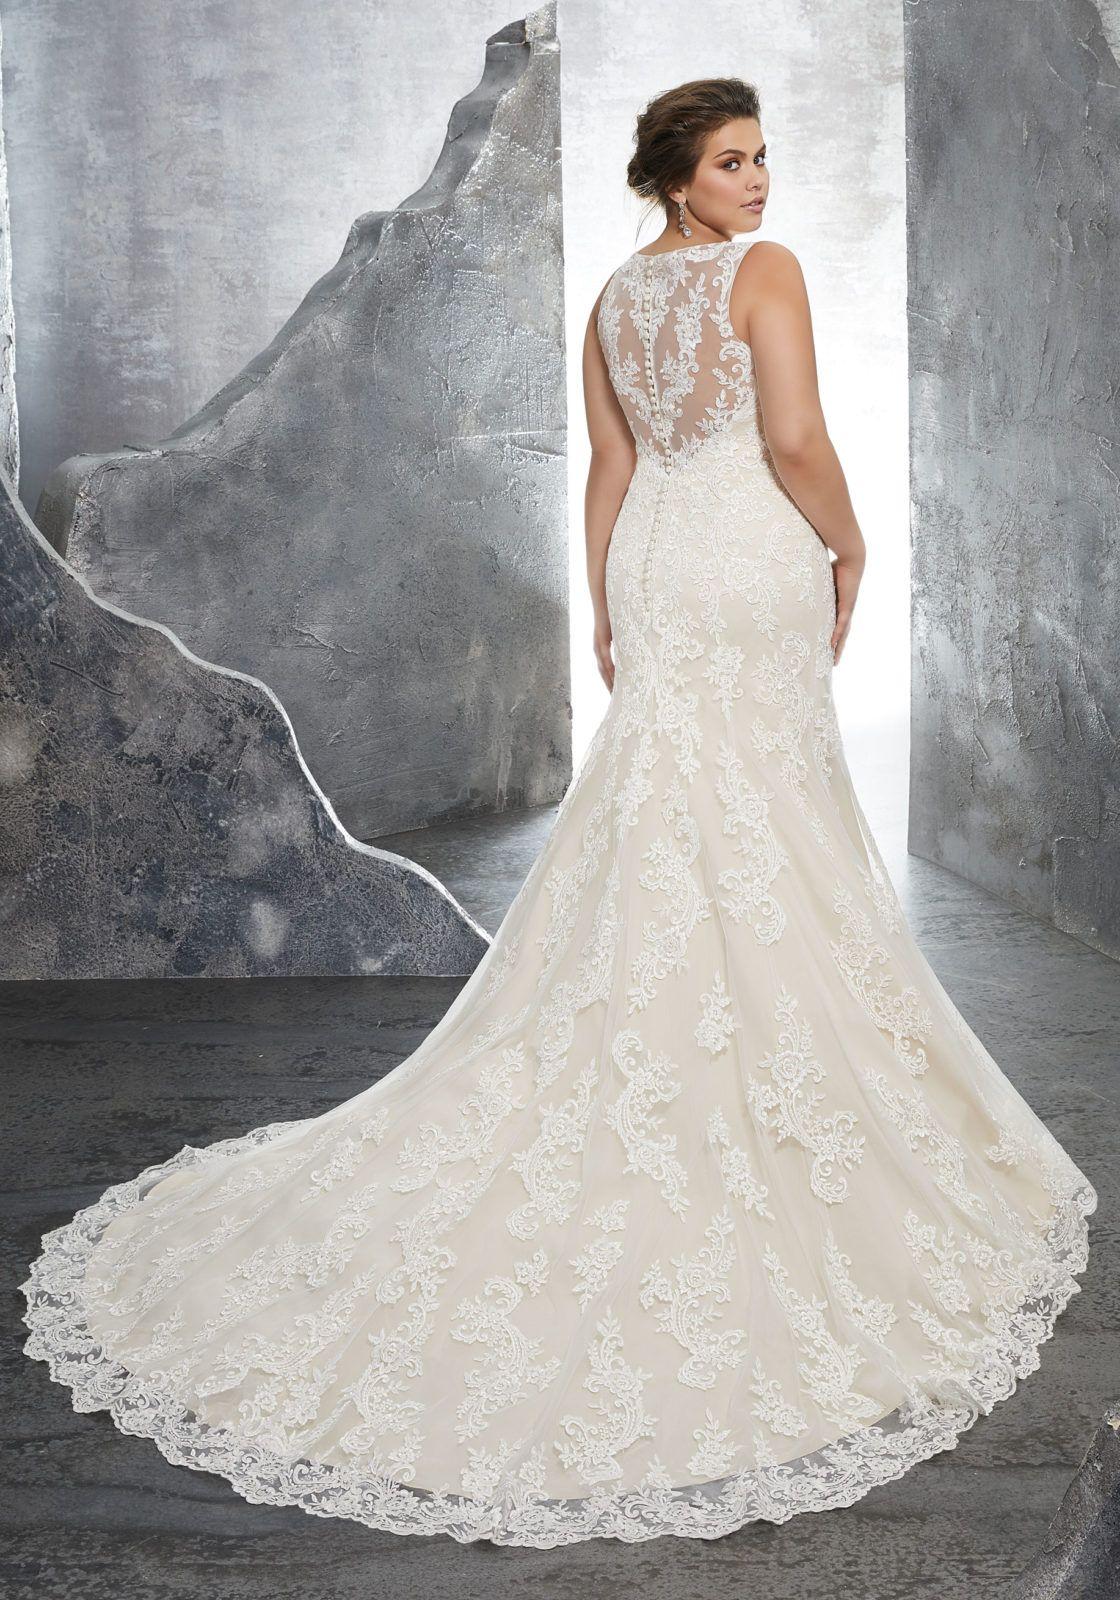 Wedding dresses for plus size brides  Keri Wedding Dress  Morilee by Madeline Gardner  Pinterest  Mori